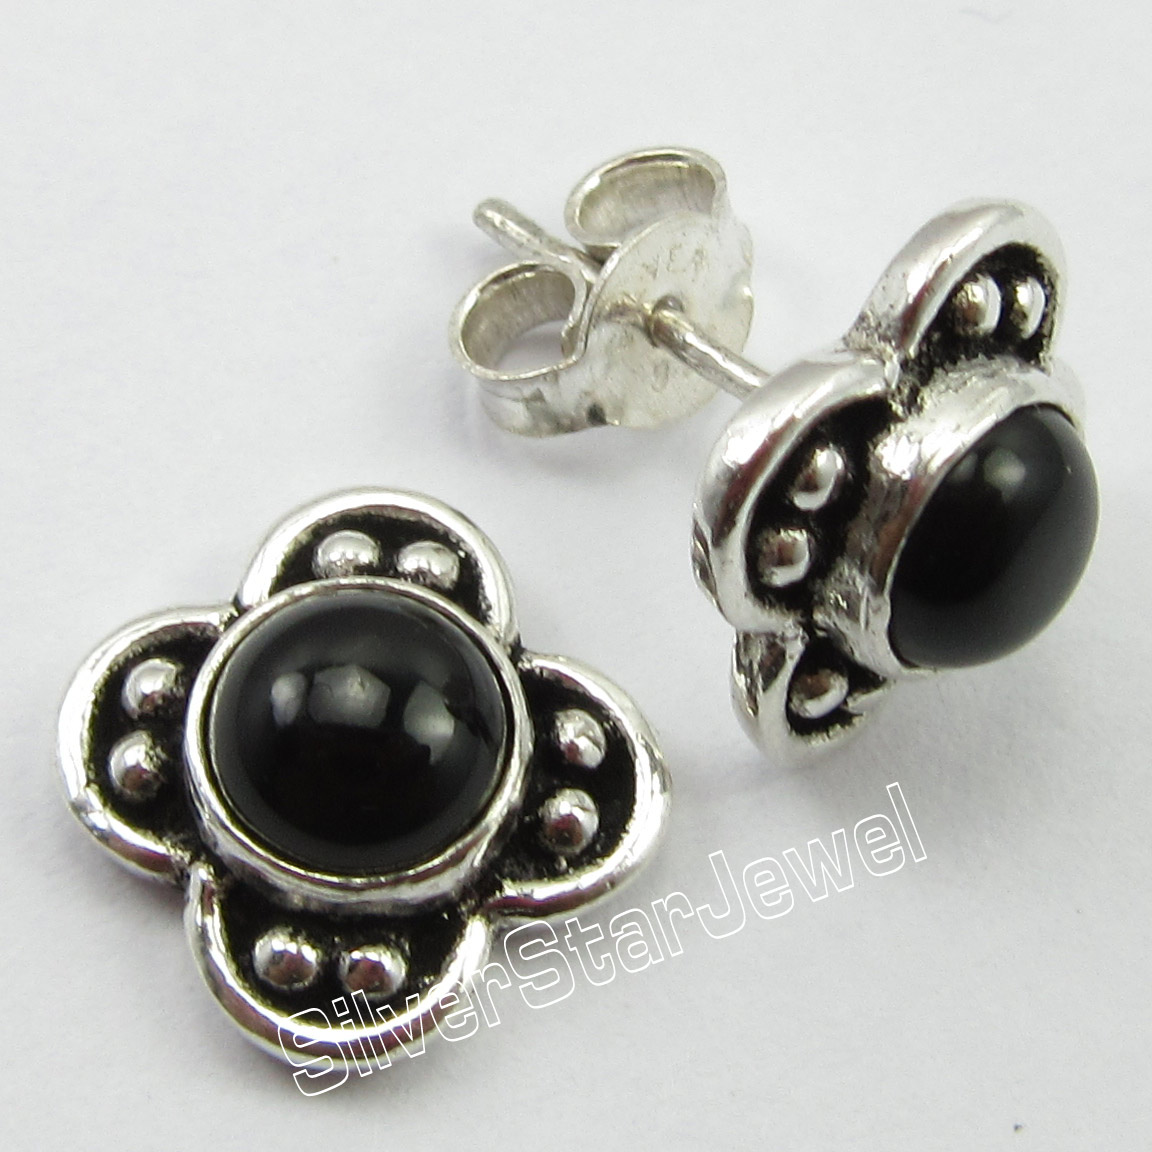 67b67ba47909 Chanti plata pura internacional negro Onyx gemset diseñador post Pendientes  1.5 cm cumpleaños